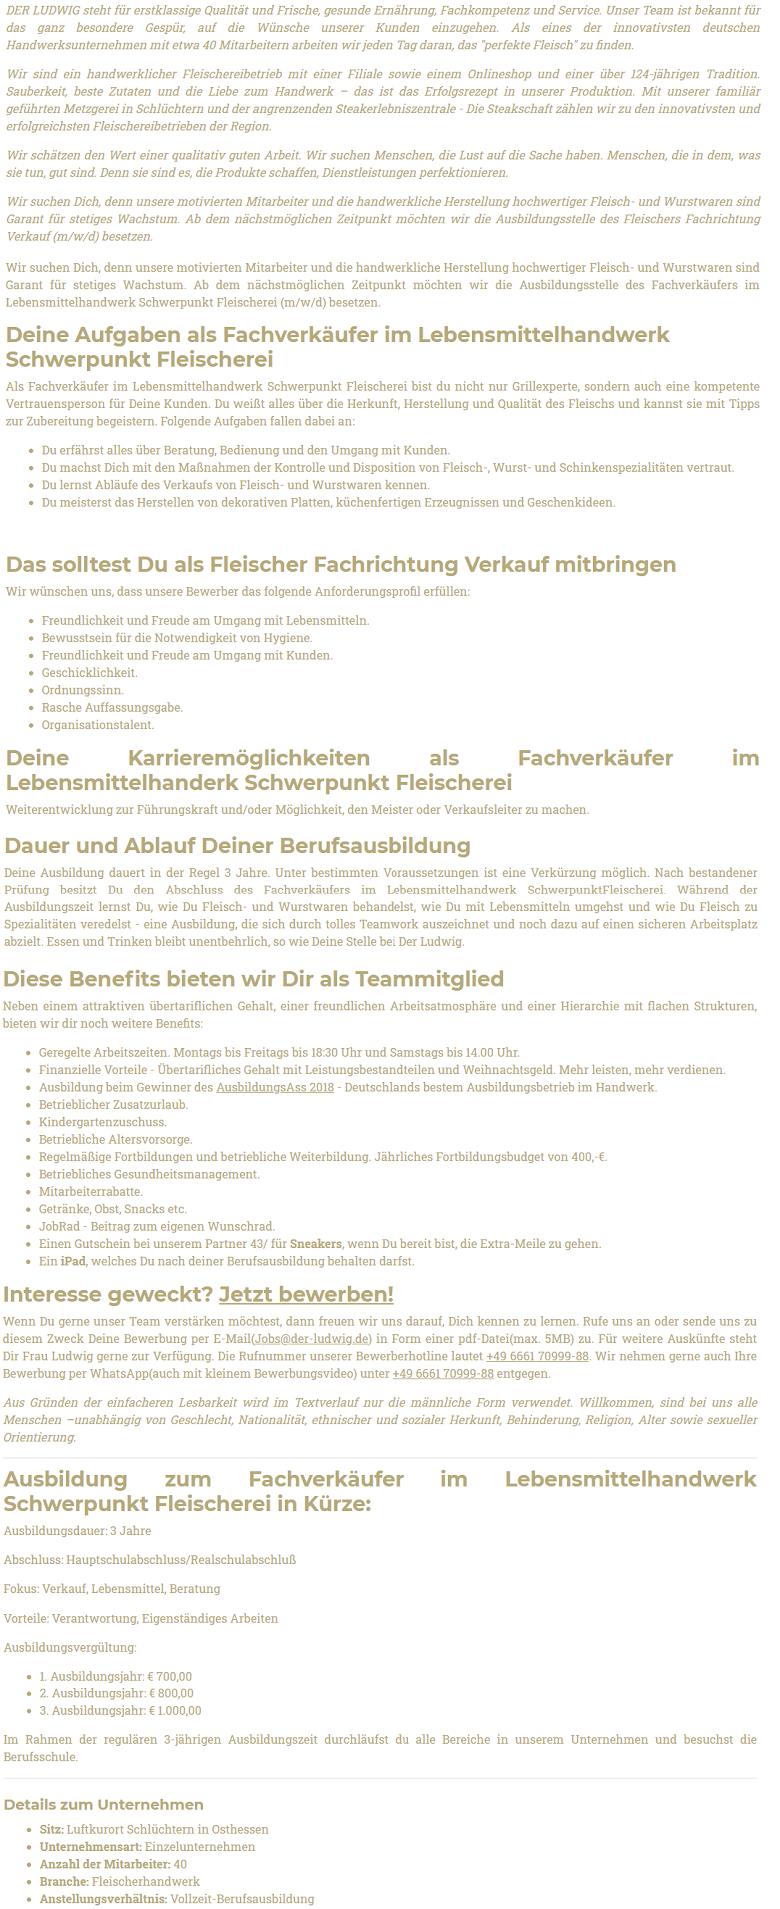 Azubi_Fachverkauf_Lebensmittelhandwerk